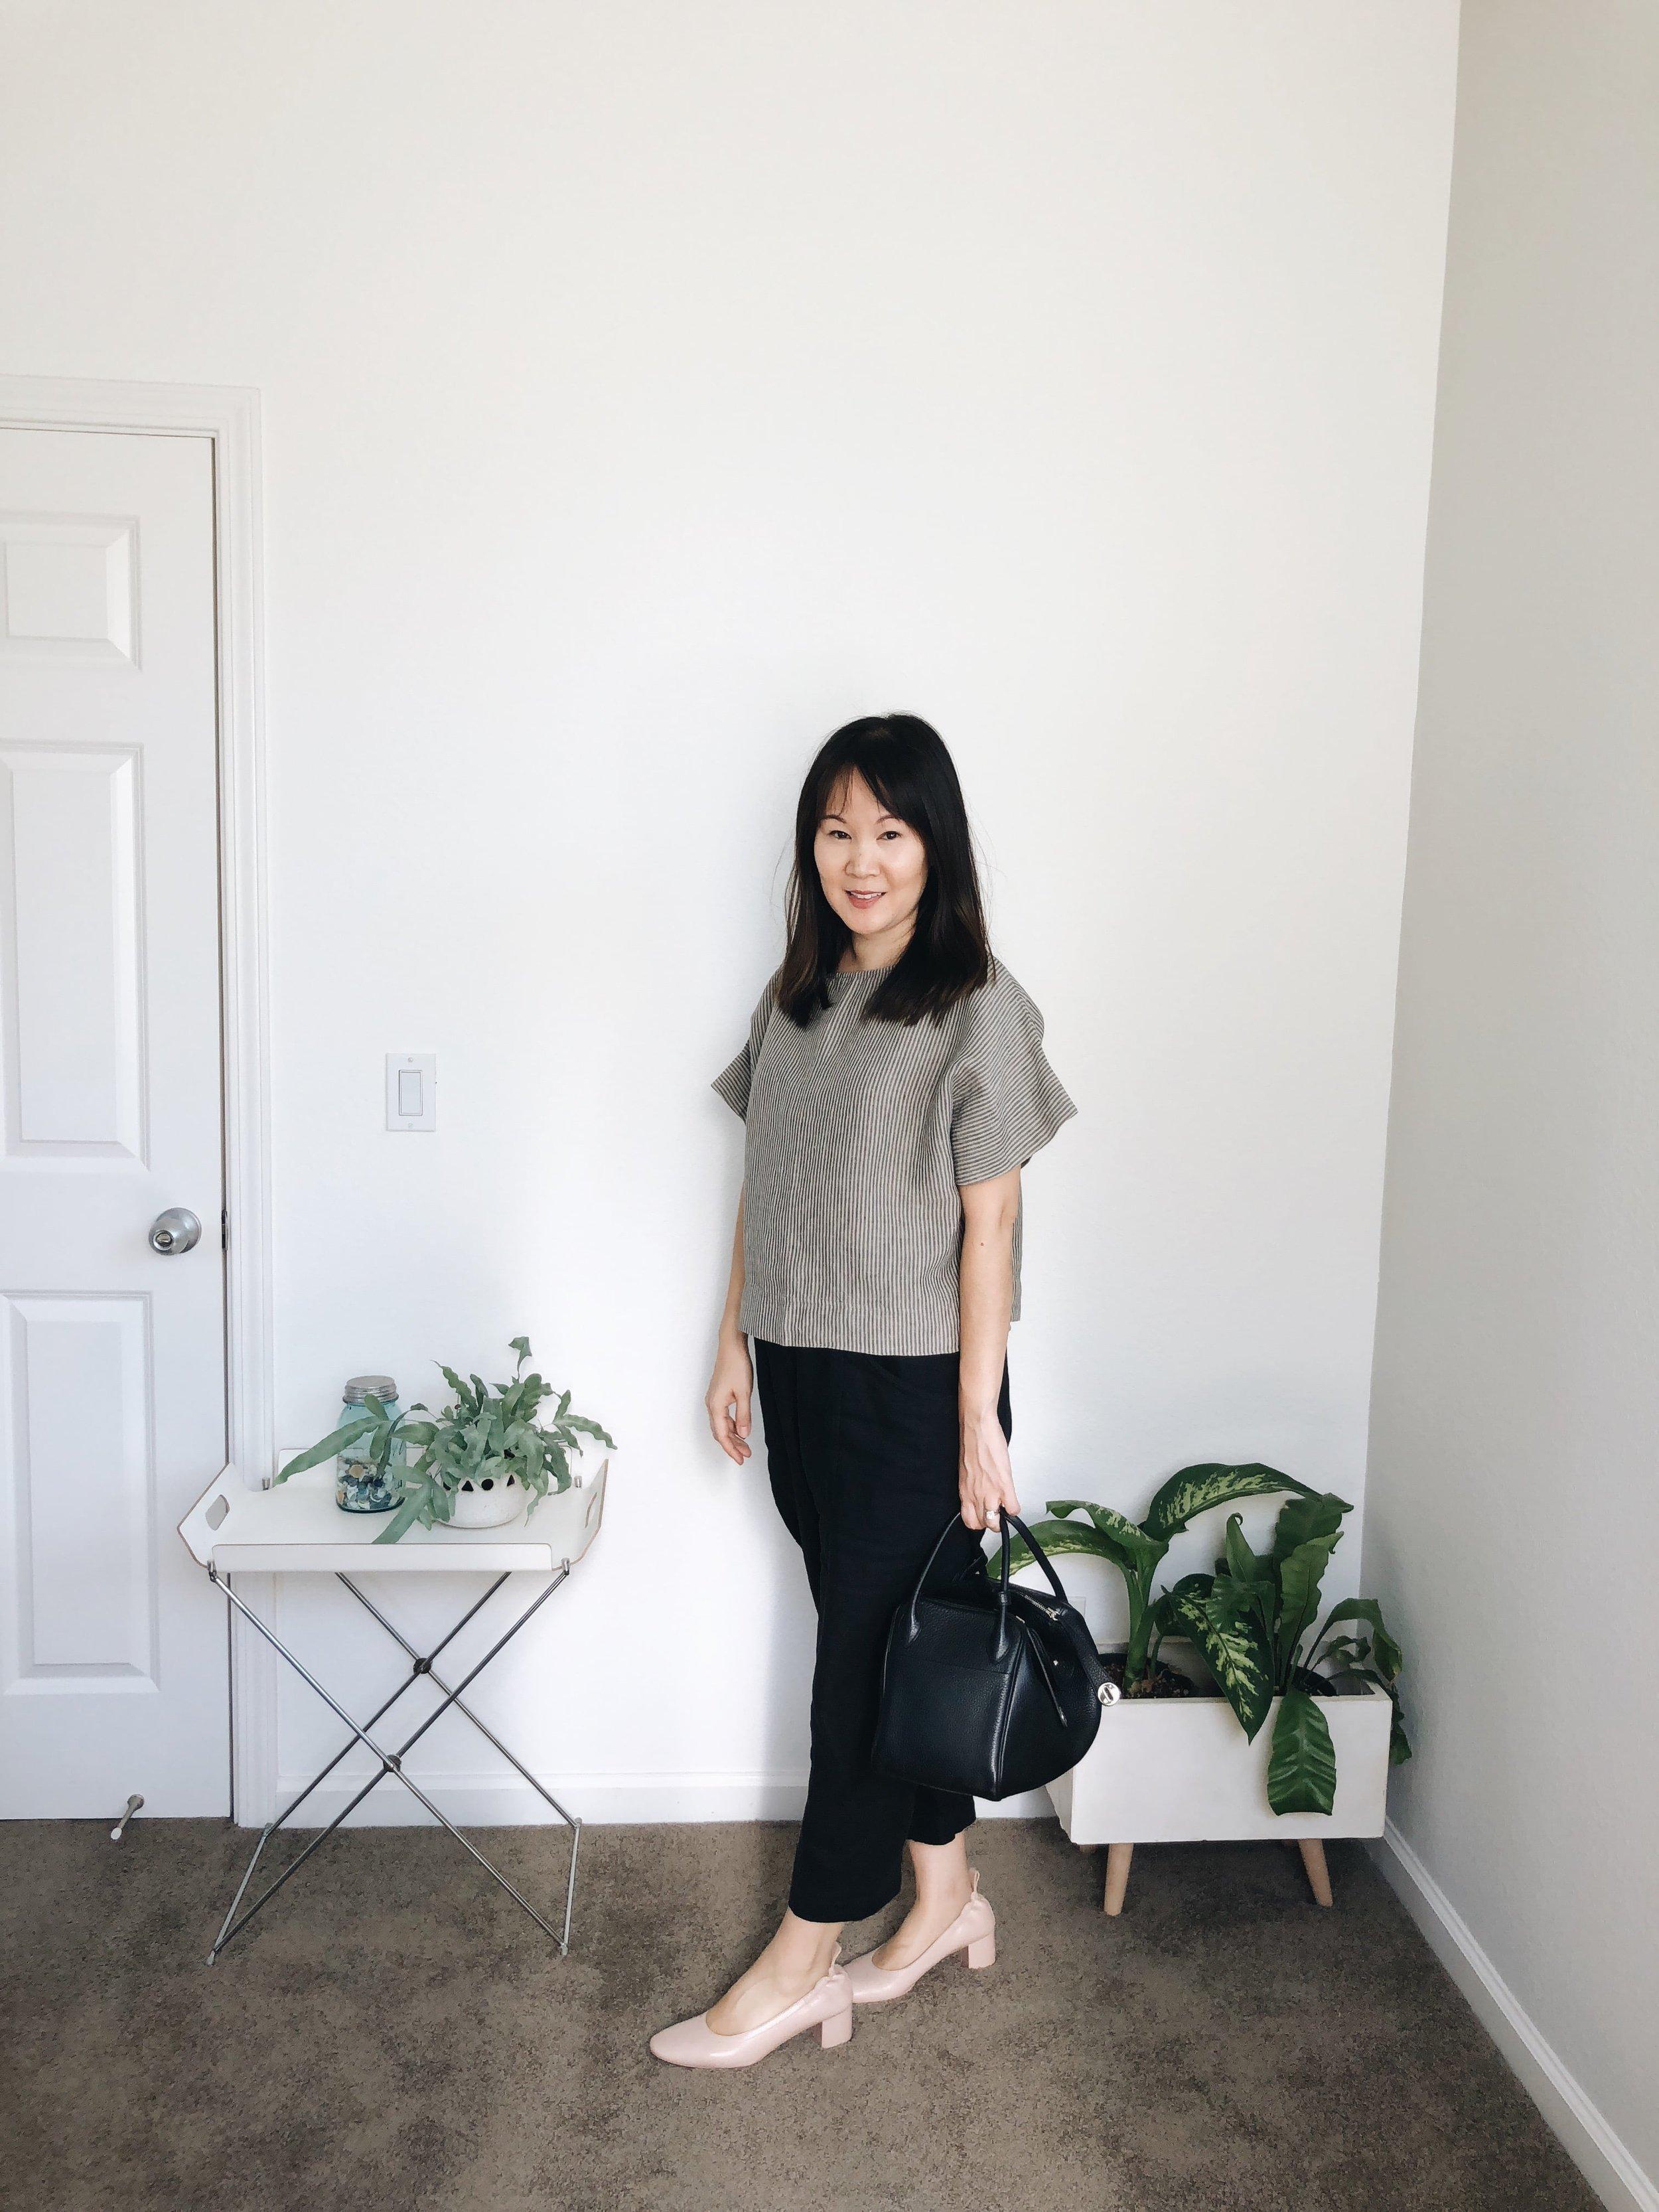 Linenfox Kimono top review